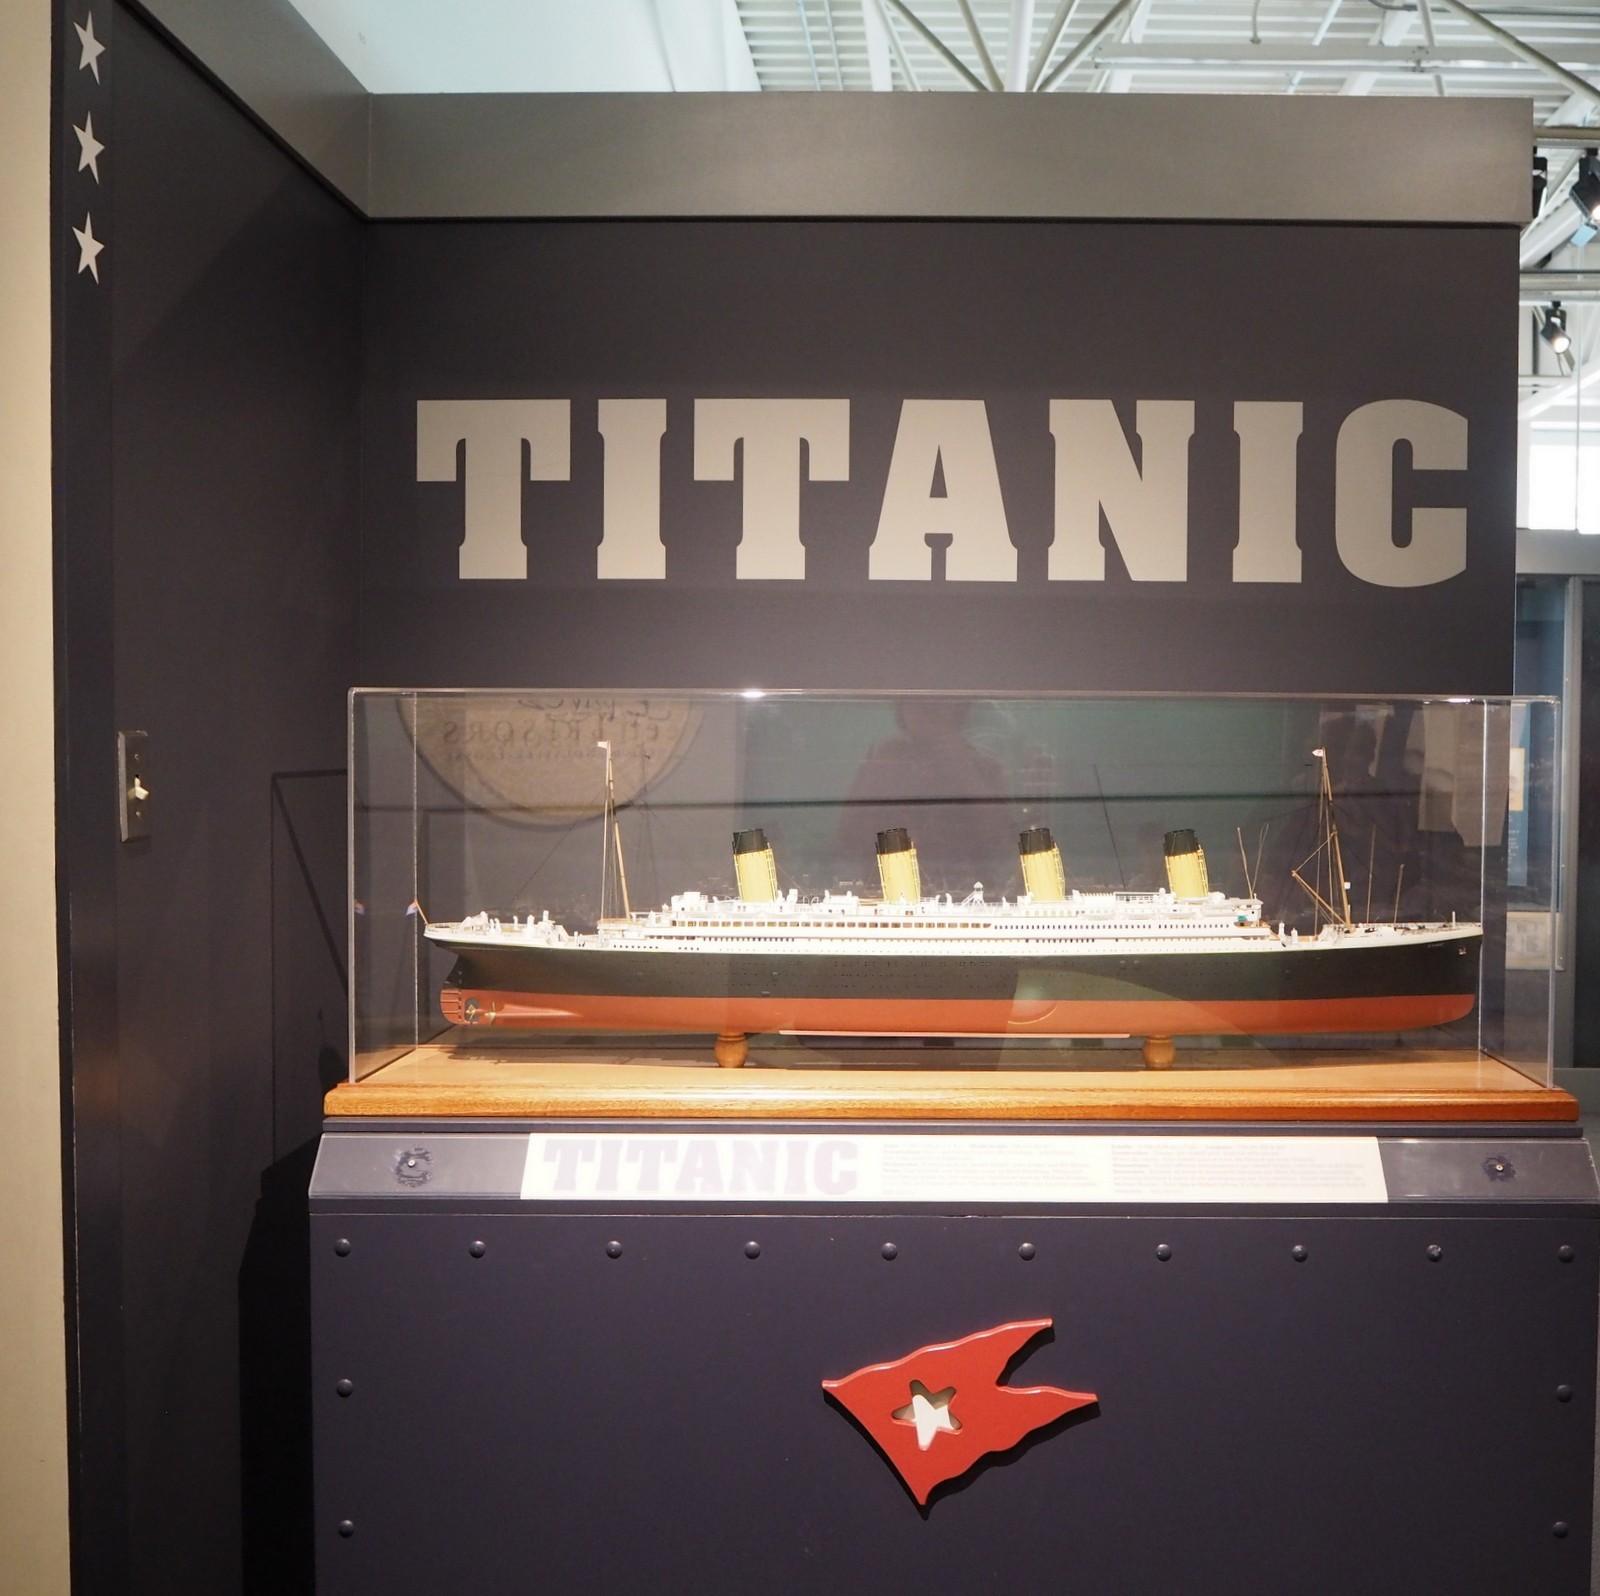 Maritime Museum of Atlantic Halifax